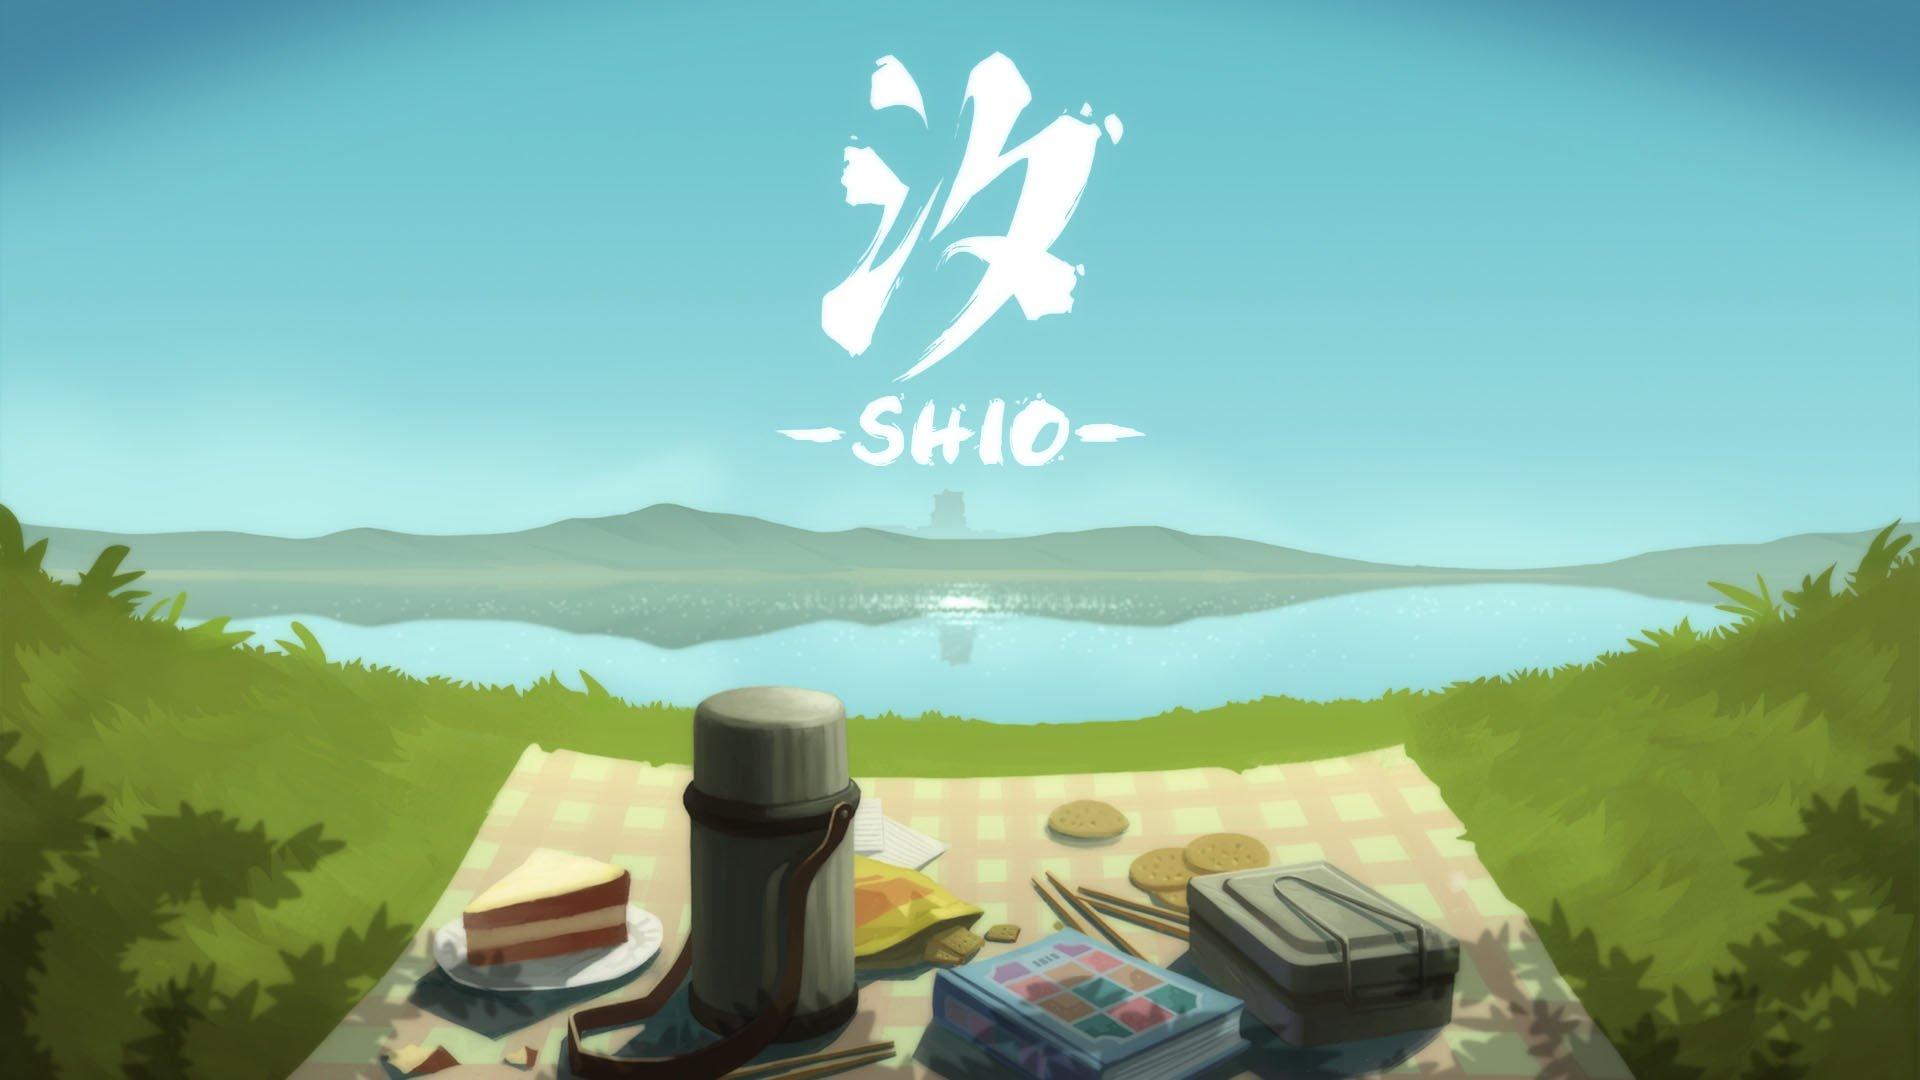 Shio Video